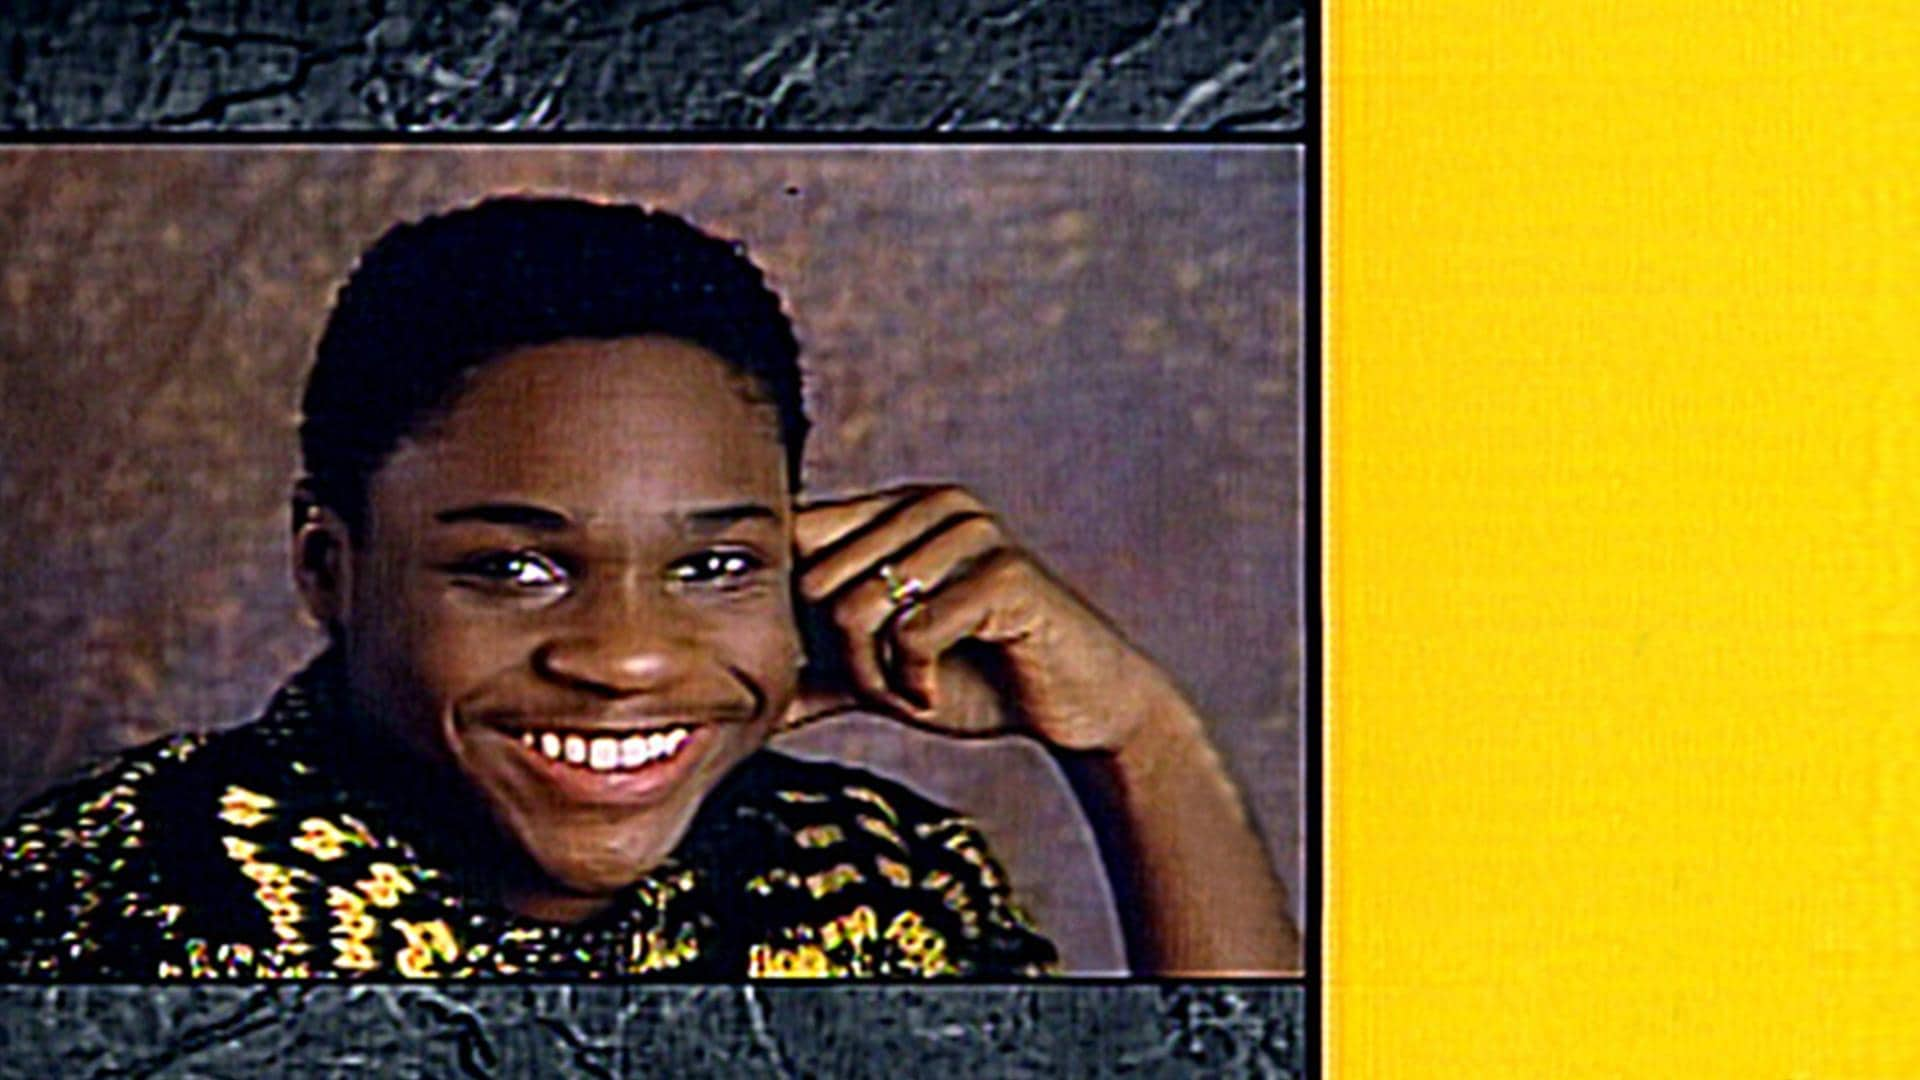 Malcolm-Jamal Warner: October 18, 1986